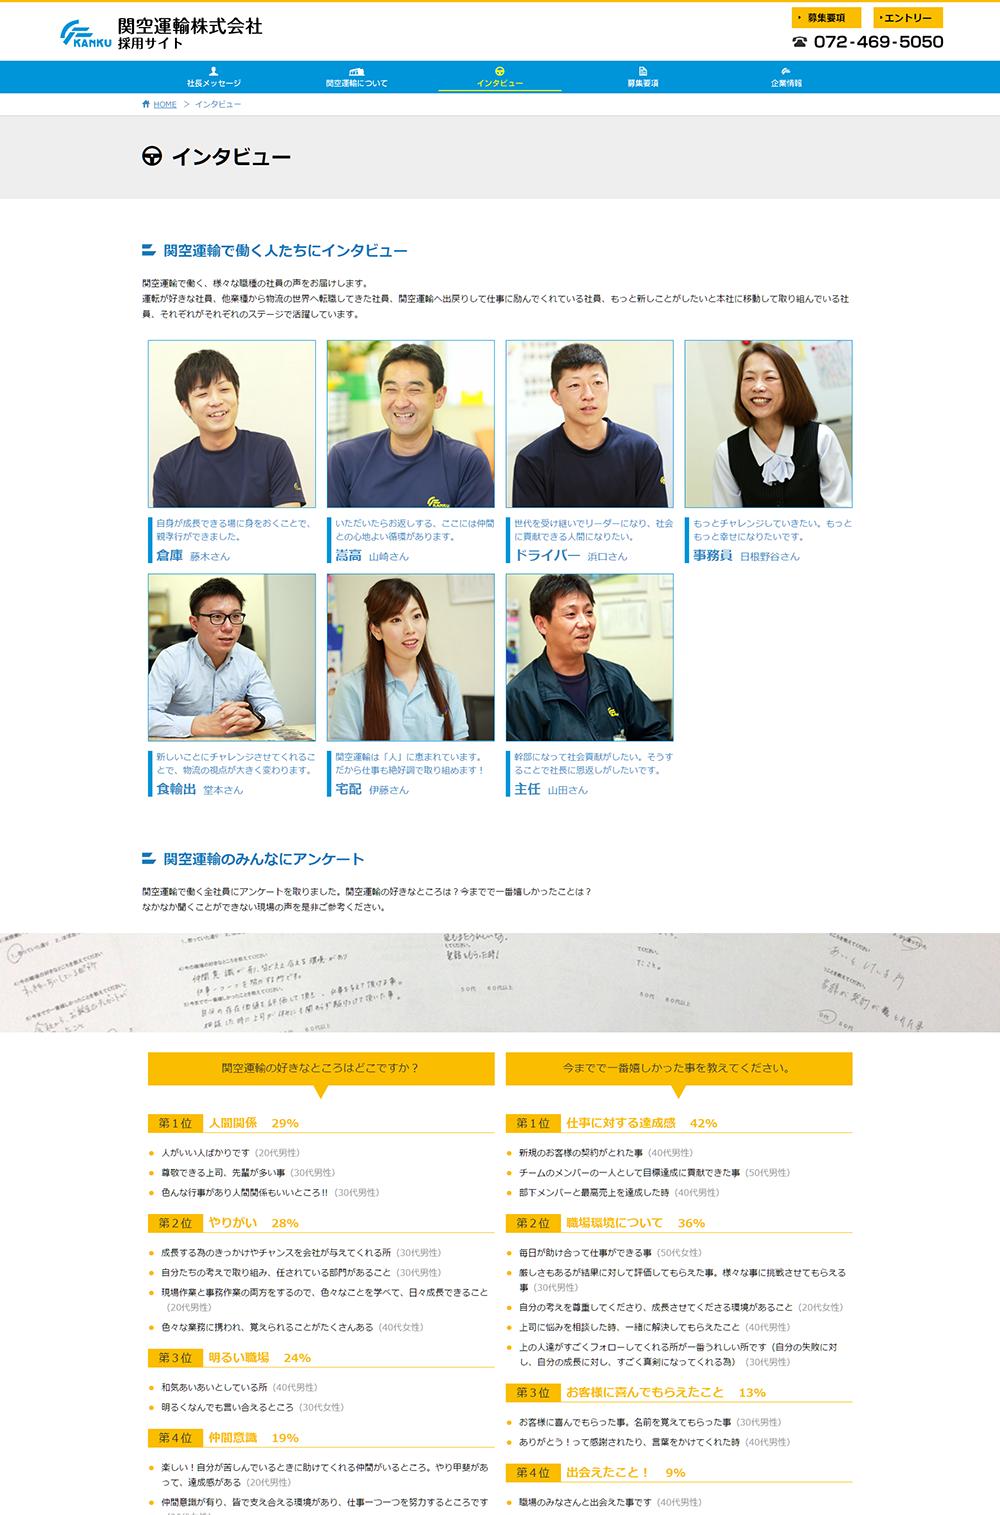 kanku-unyu_recruit4